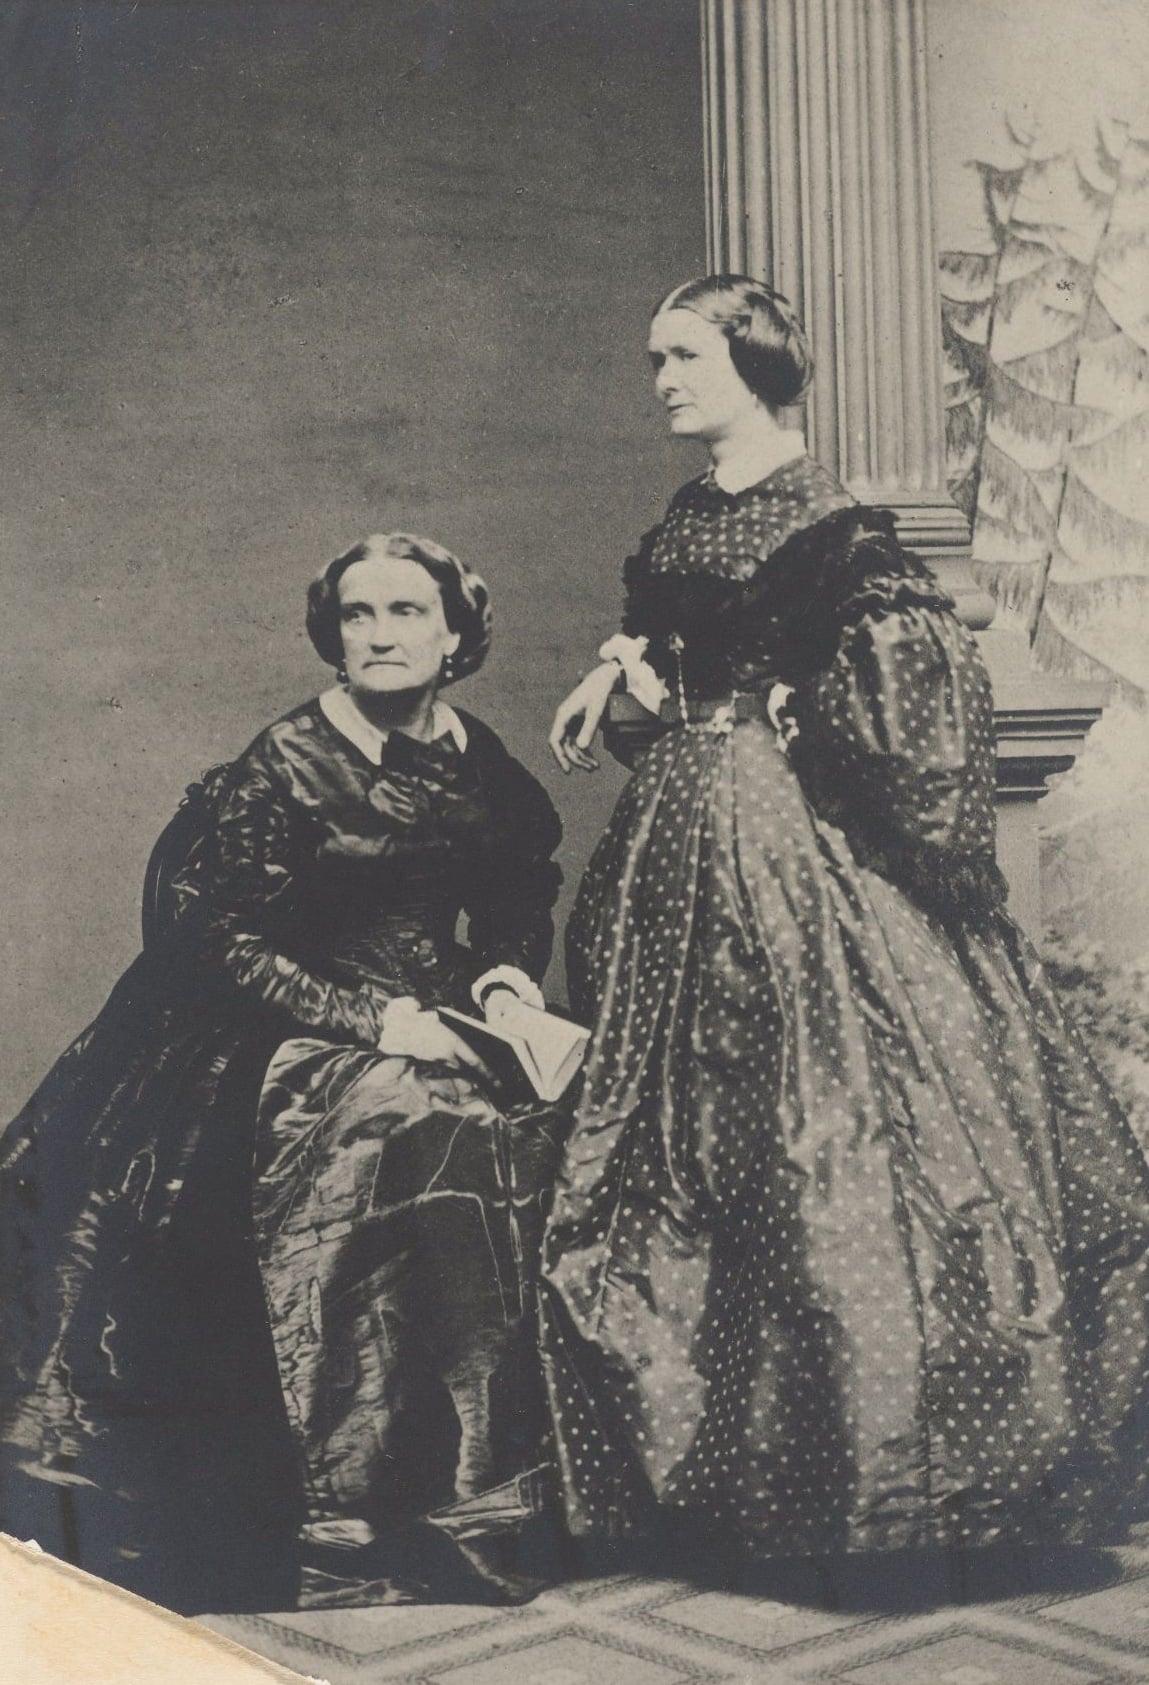 Emma Stebbins & Charlotte Cushman